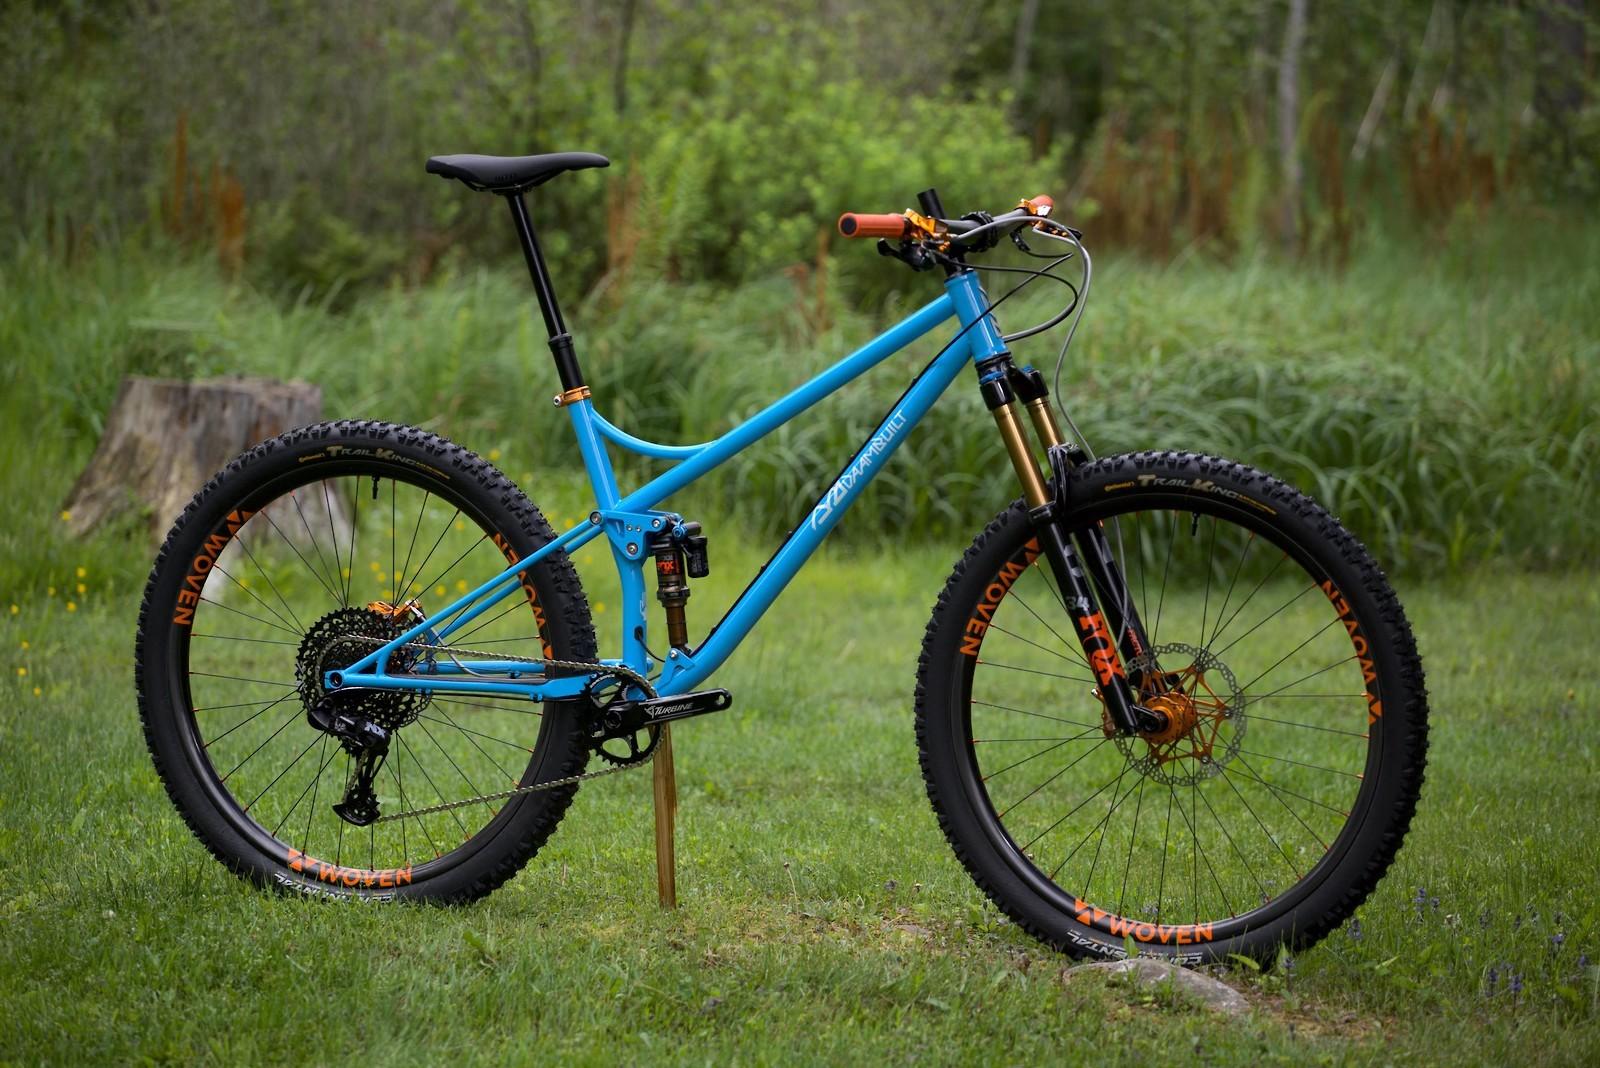 Daambuilt Full Suspension - Vital Bike of the Day June 2021 - Mountain Biking Pictures - Vital MTB